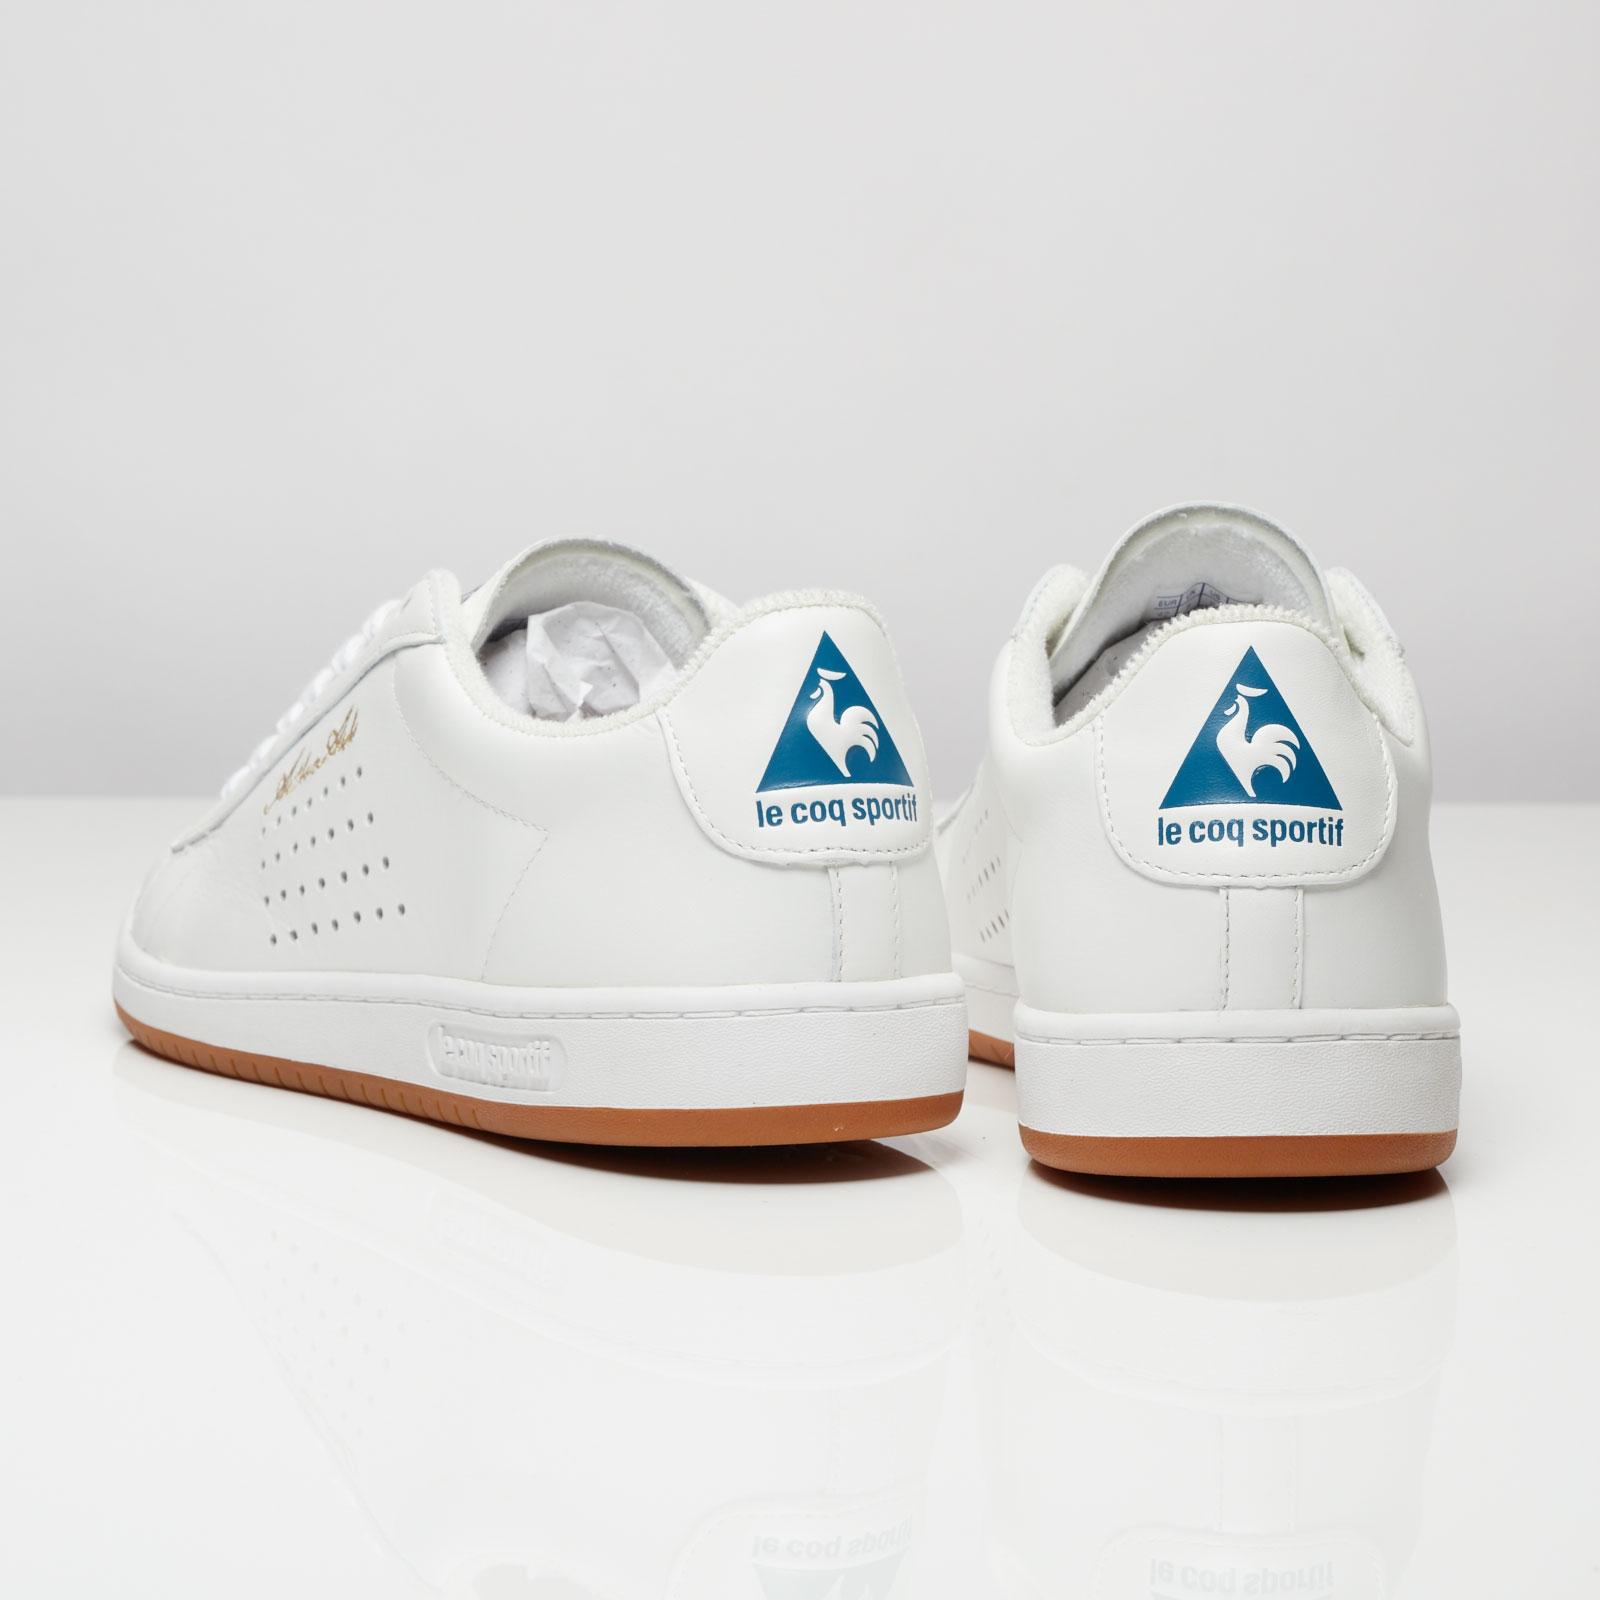 6985b23a756f Le Coq Sportif LCS Arthur Ashe Royal - 1610675 - Sneakersnstuff ...